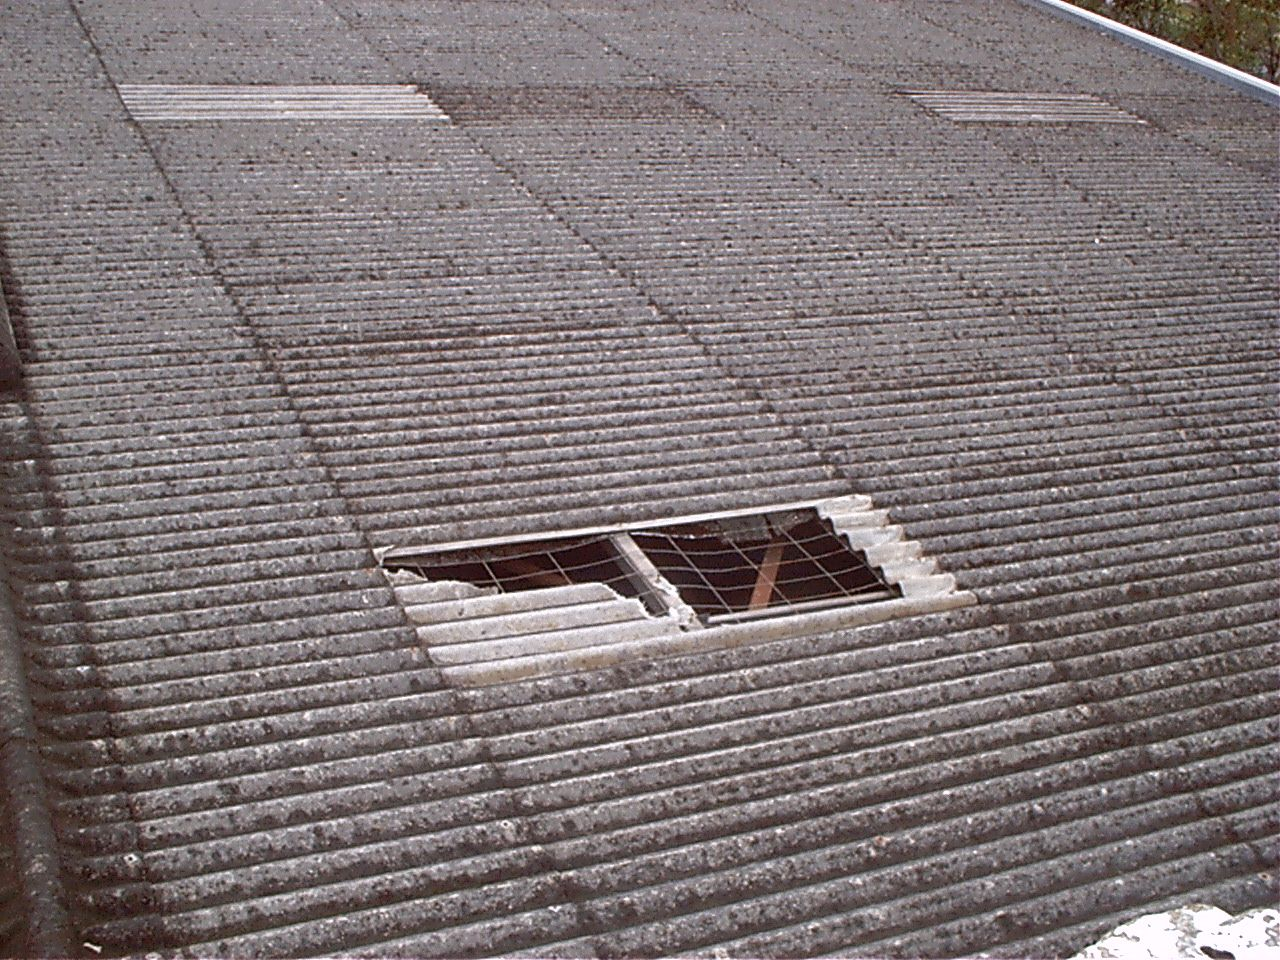 Asbestos Cement Roof Cladding With Broken Skylight Roof Cladding Skylight Asbestos